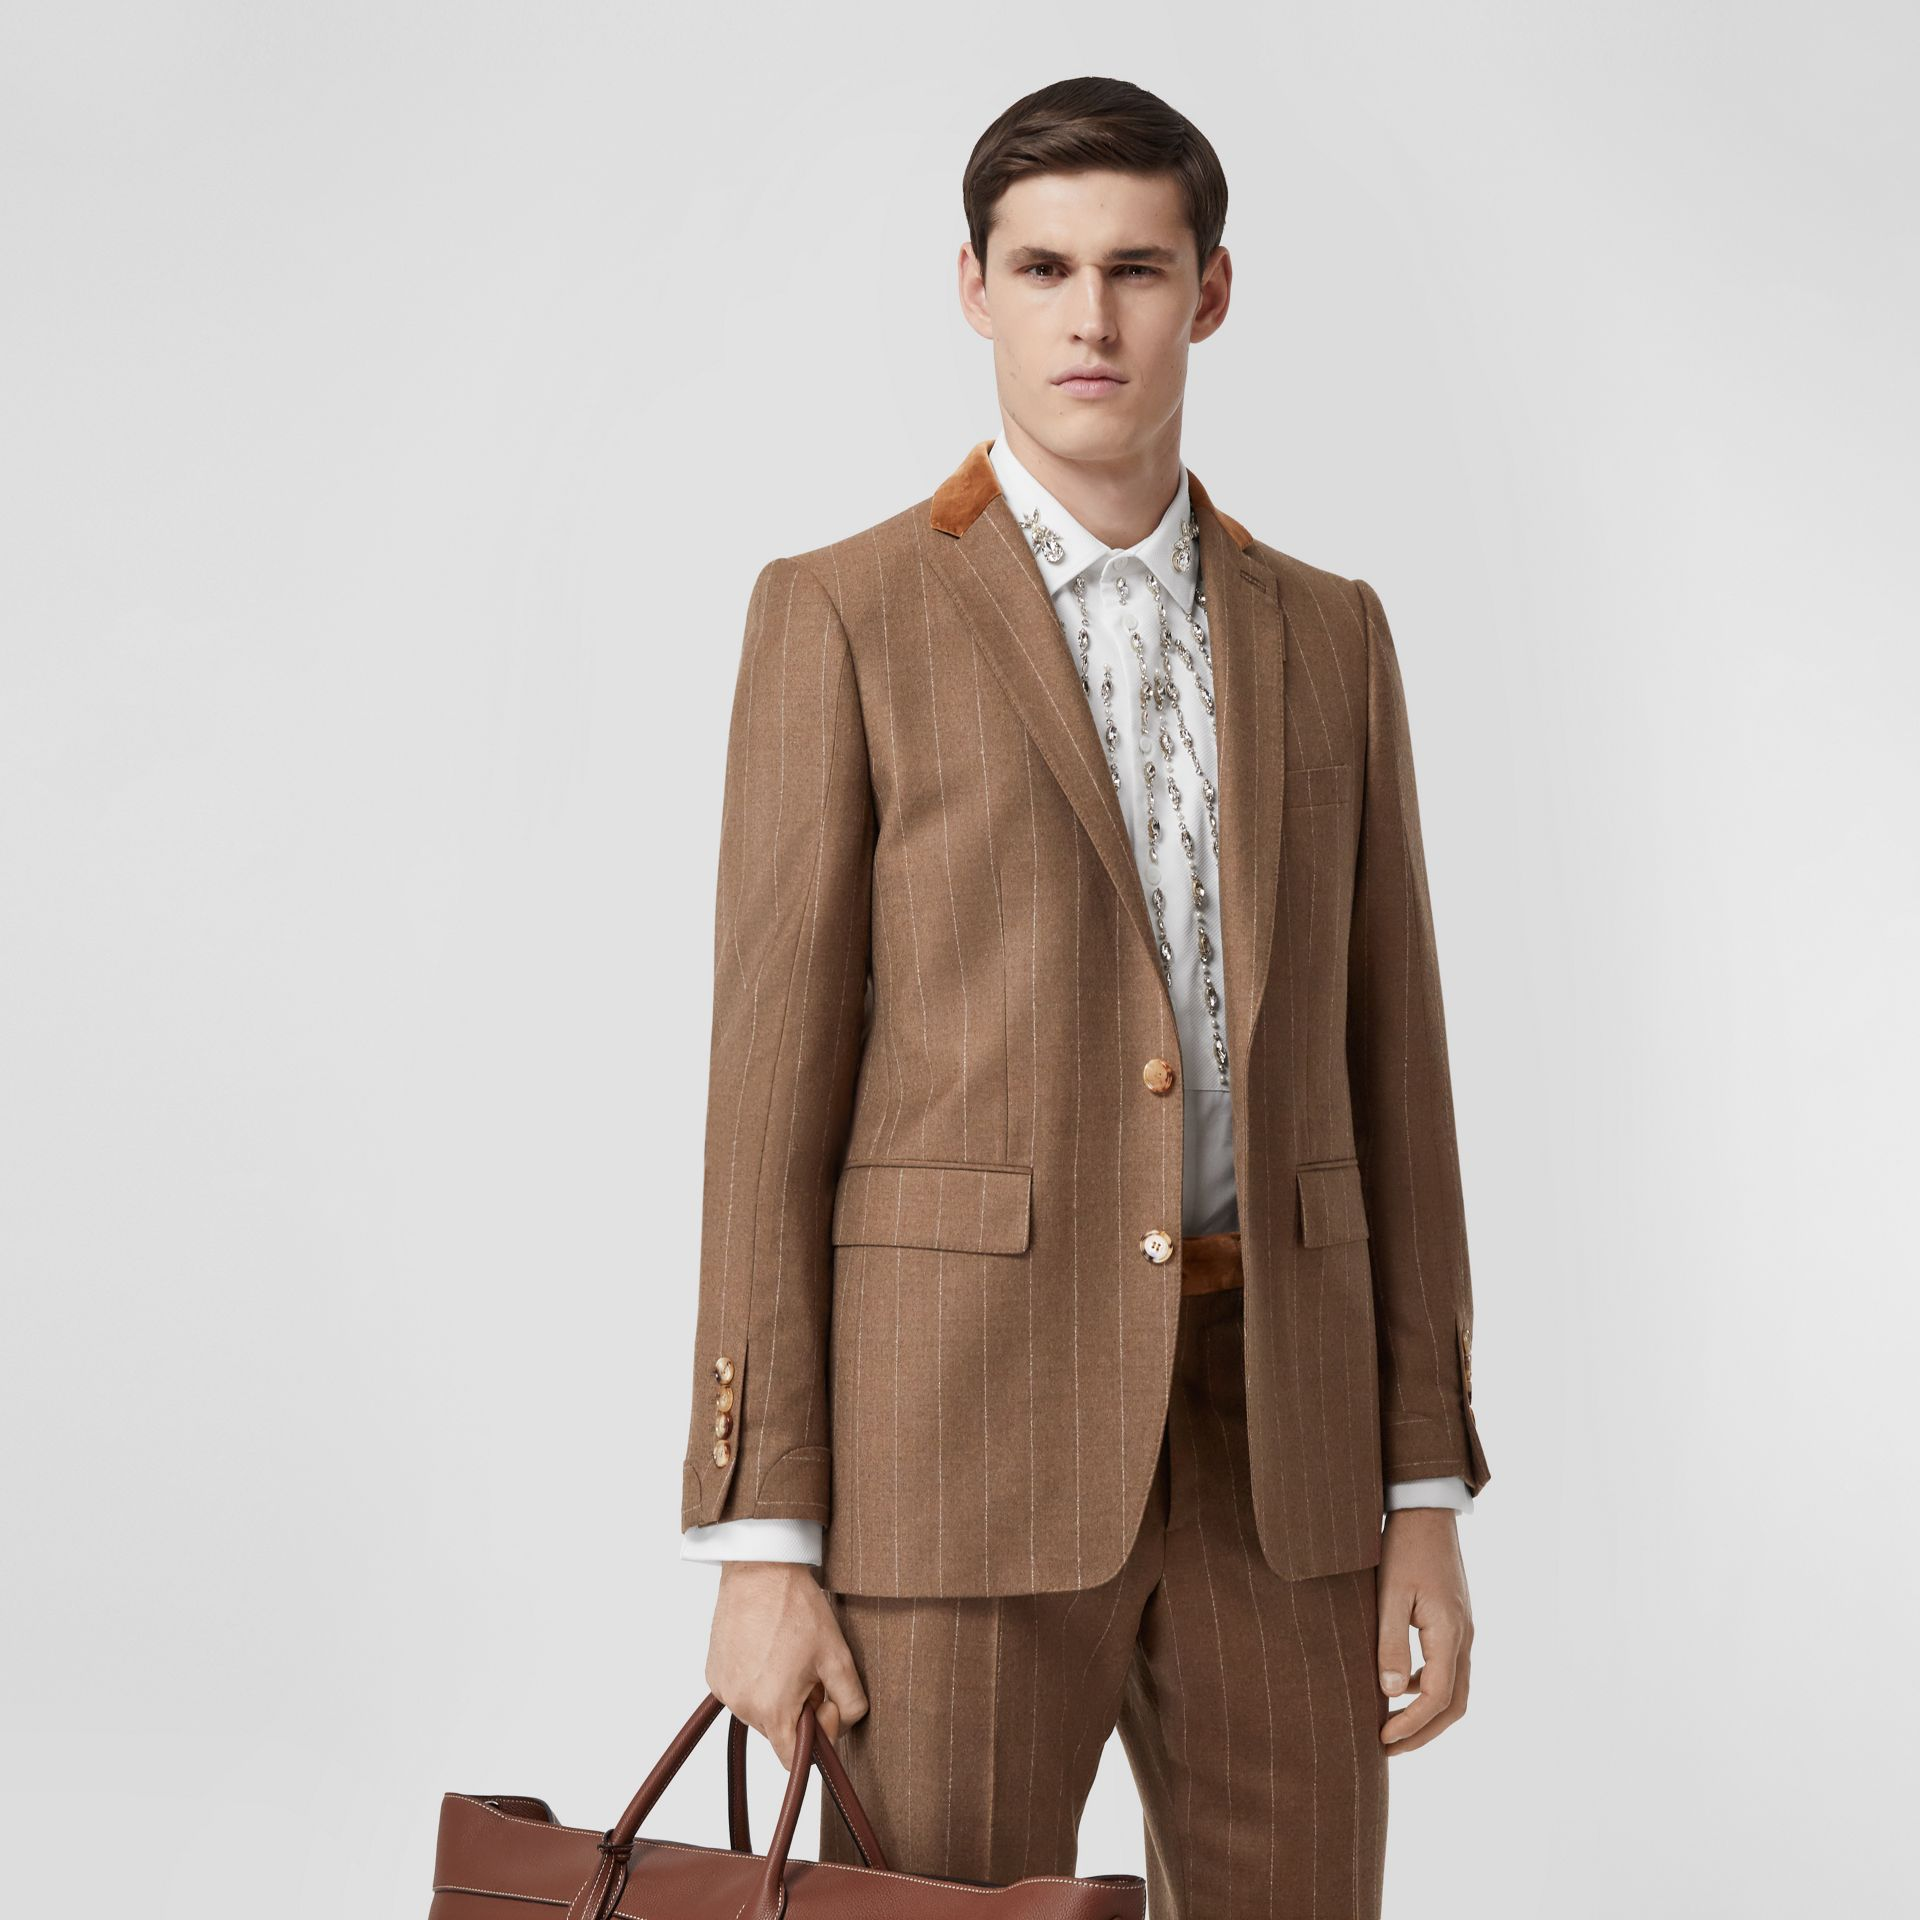 Classic Fit Velvet Trim Wool Cashmere Tailored Jacket in Dark Tan - Men | Burberry - gallery image 0